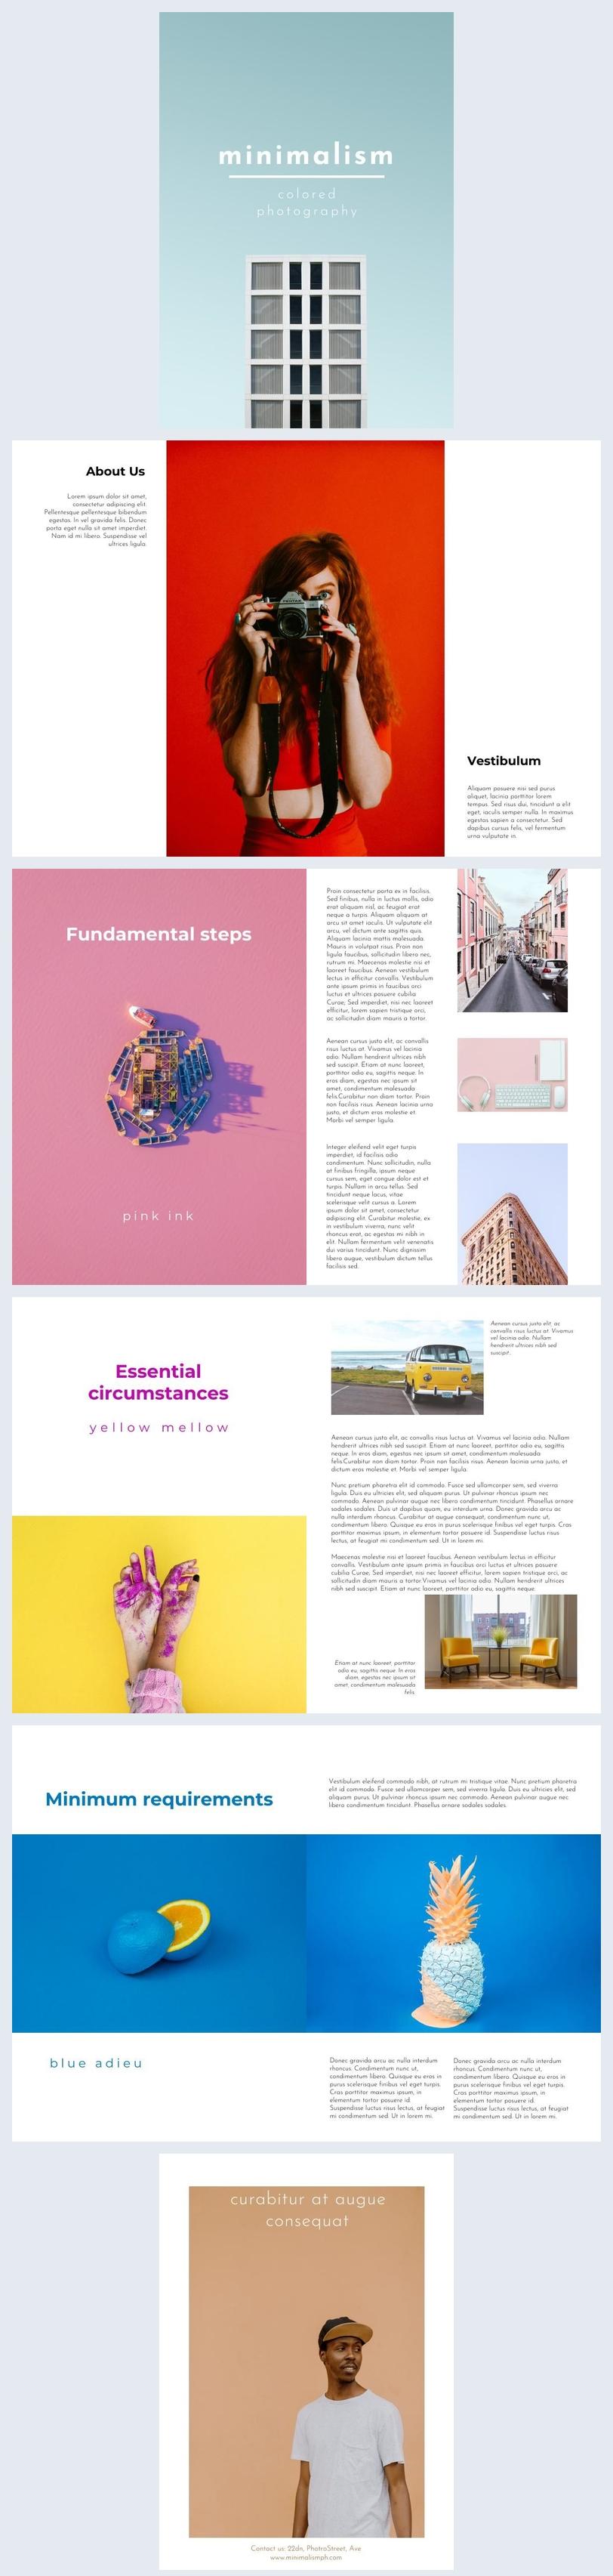 Minimalist Photography Magazine Design